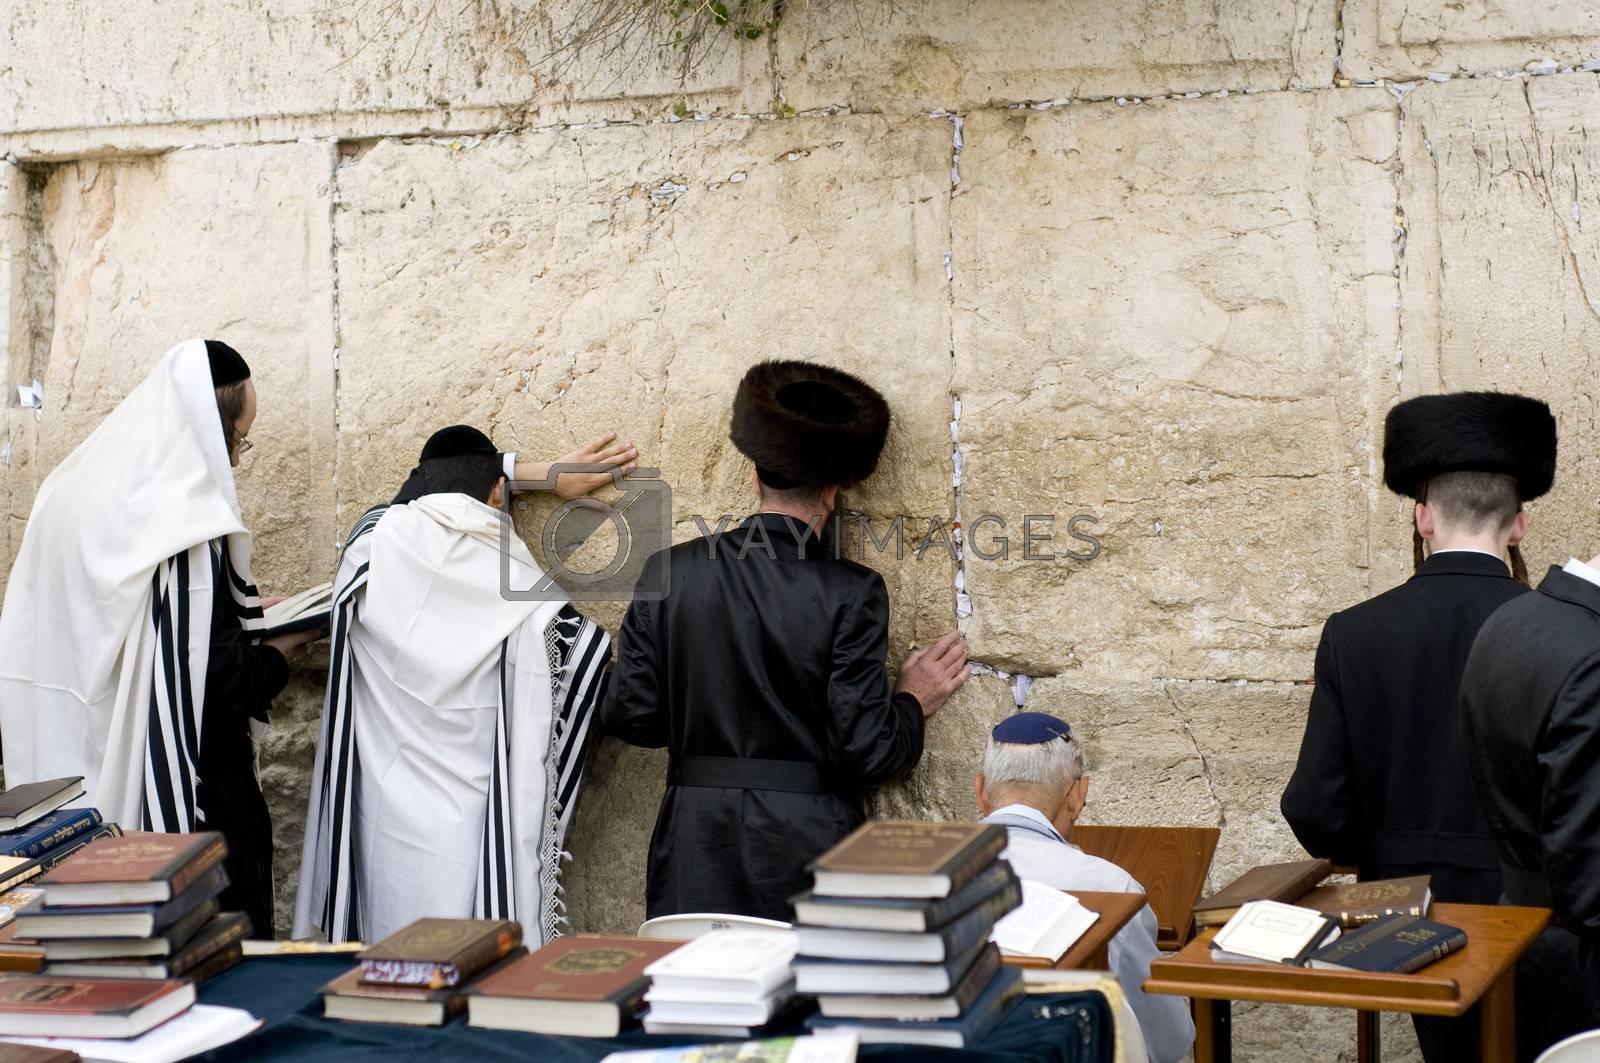 Jewish praying near Jerusalem western wall during passover celebration